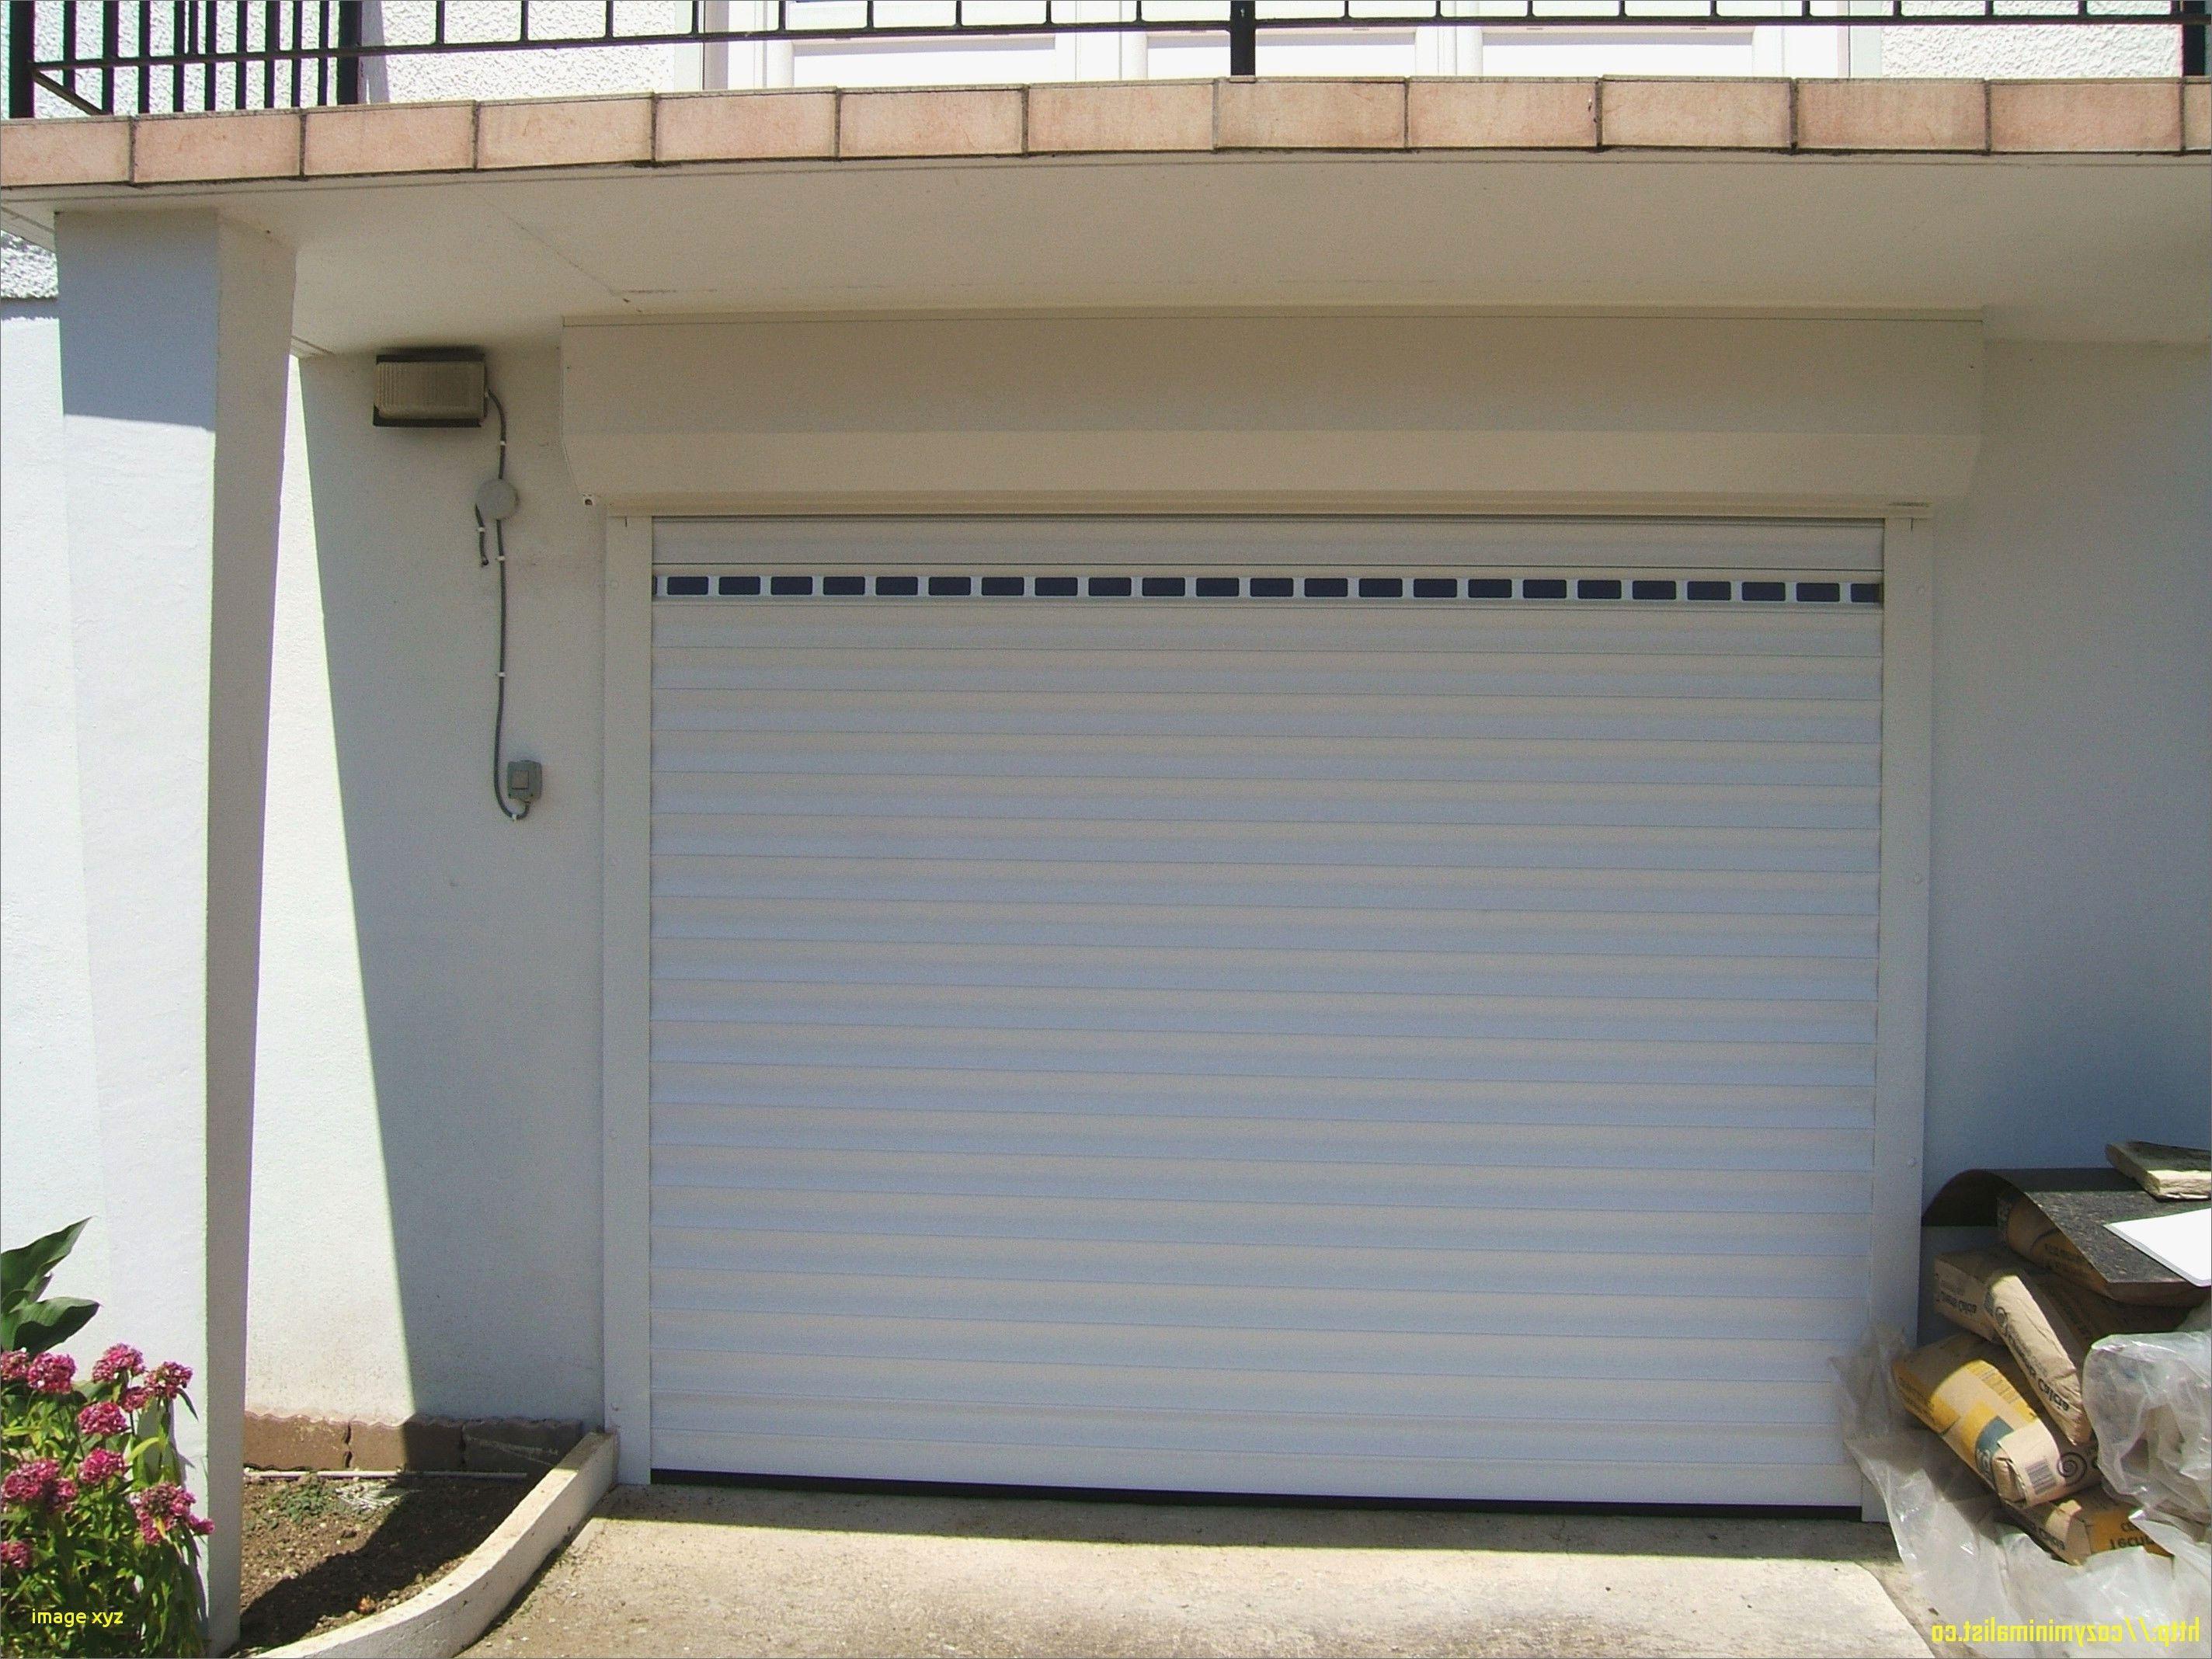 Luxury Poignee Porte De Garage Sectionnelle Interior Design Bedroom Bedroom Interior Home